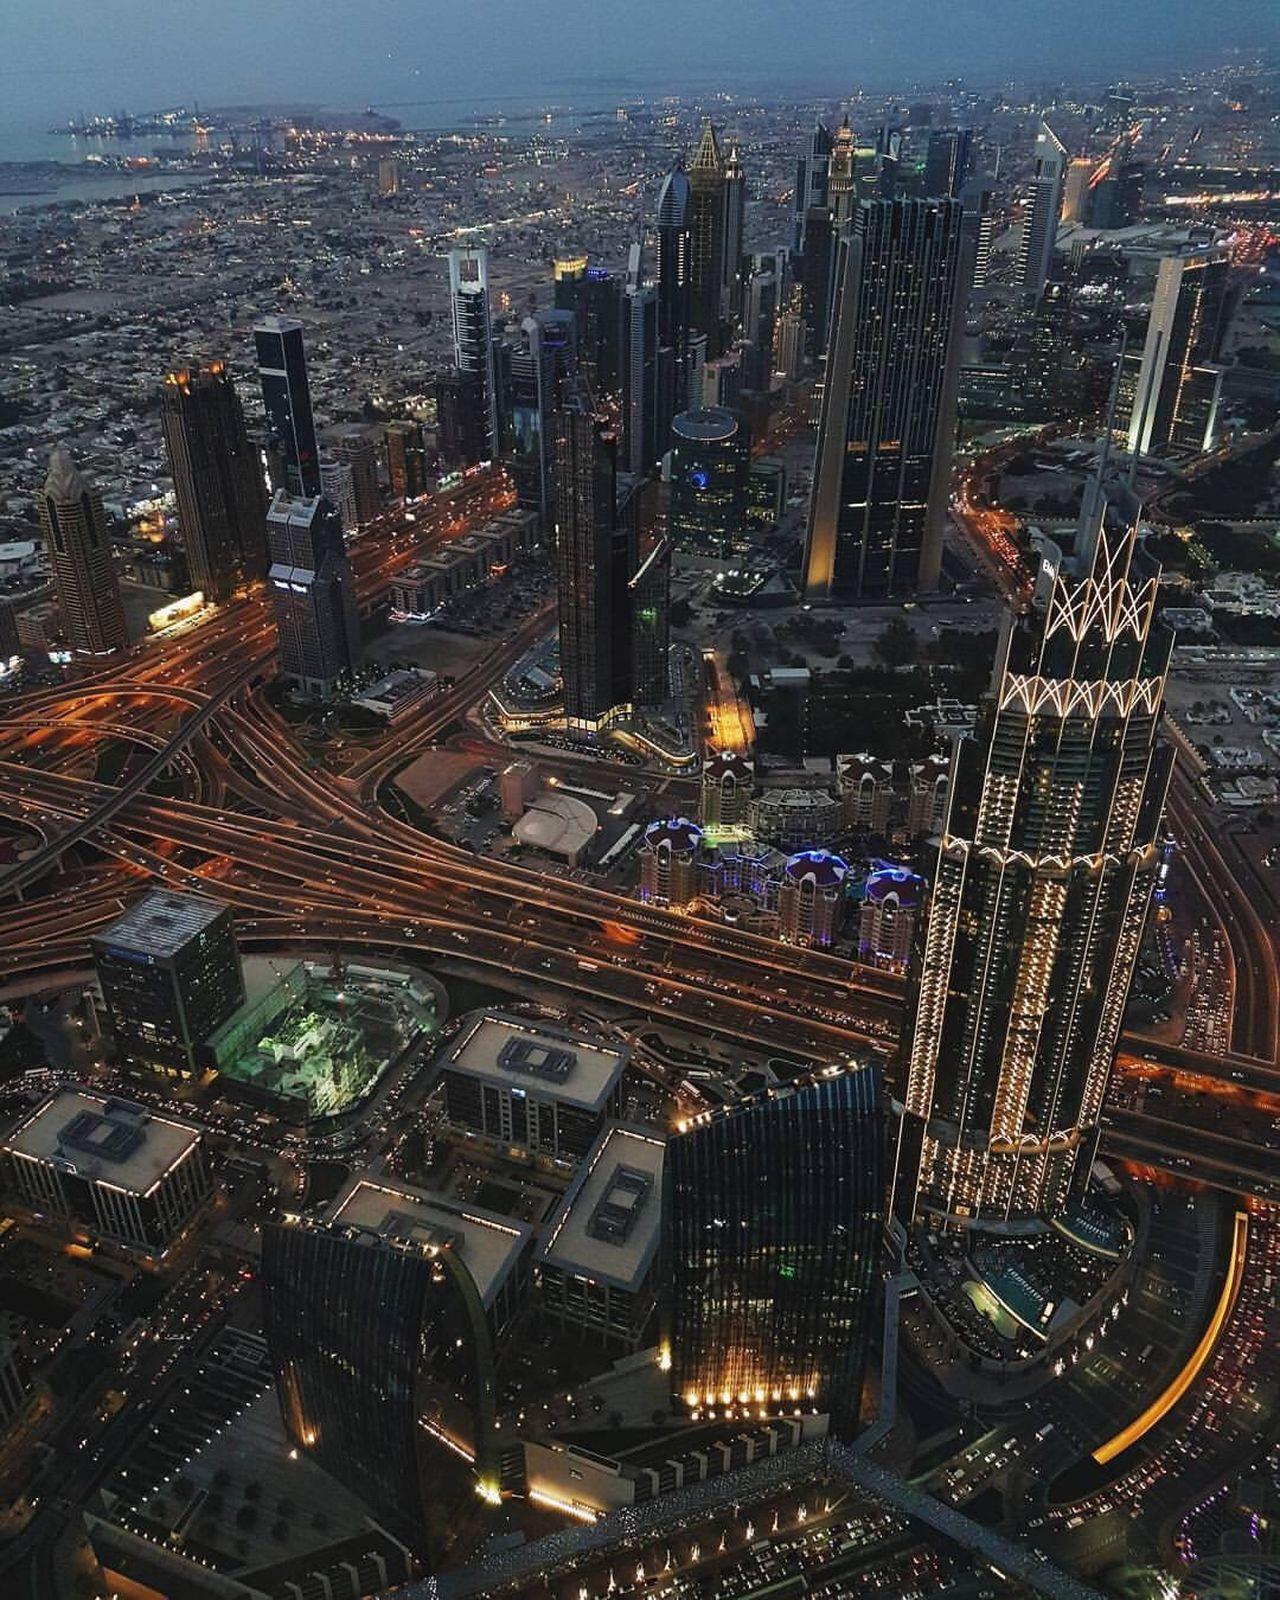 dusk @the top burj khalifa Dubai Mall DXB Burj Khalifa Night Skyscraper At The Top Neighborhood Map The Architect - 2017 EyeEm Awards